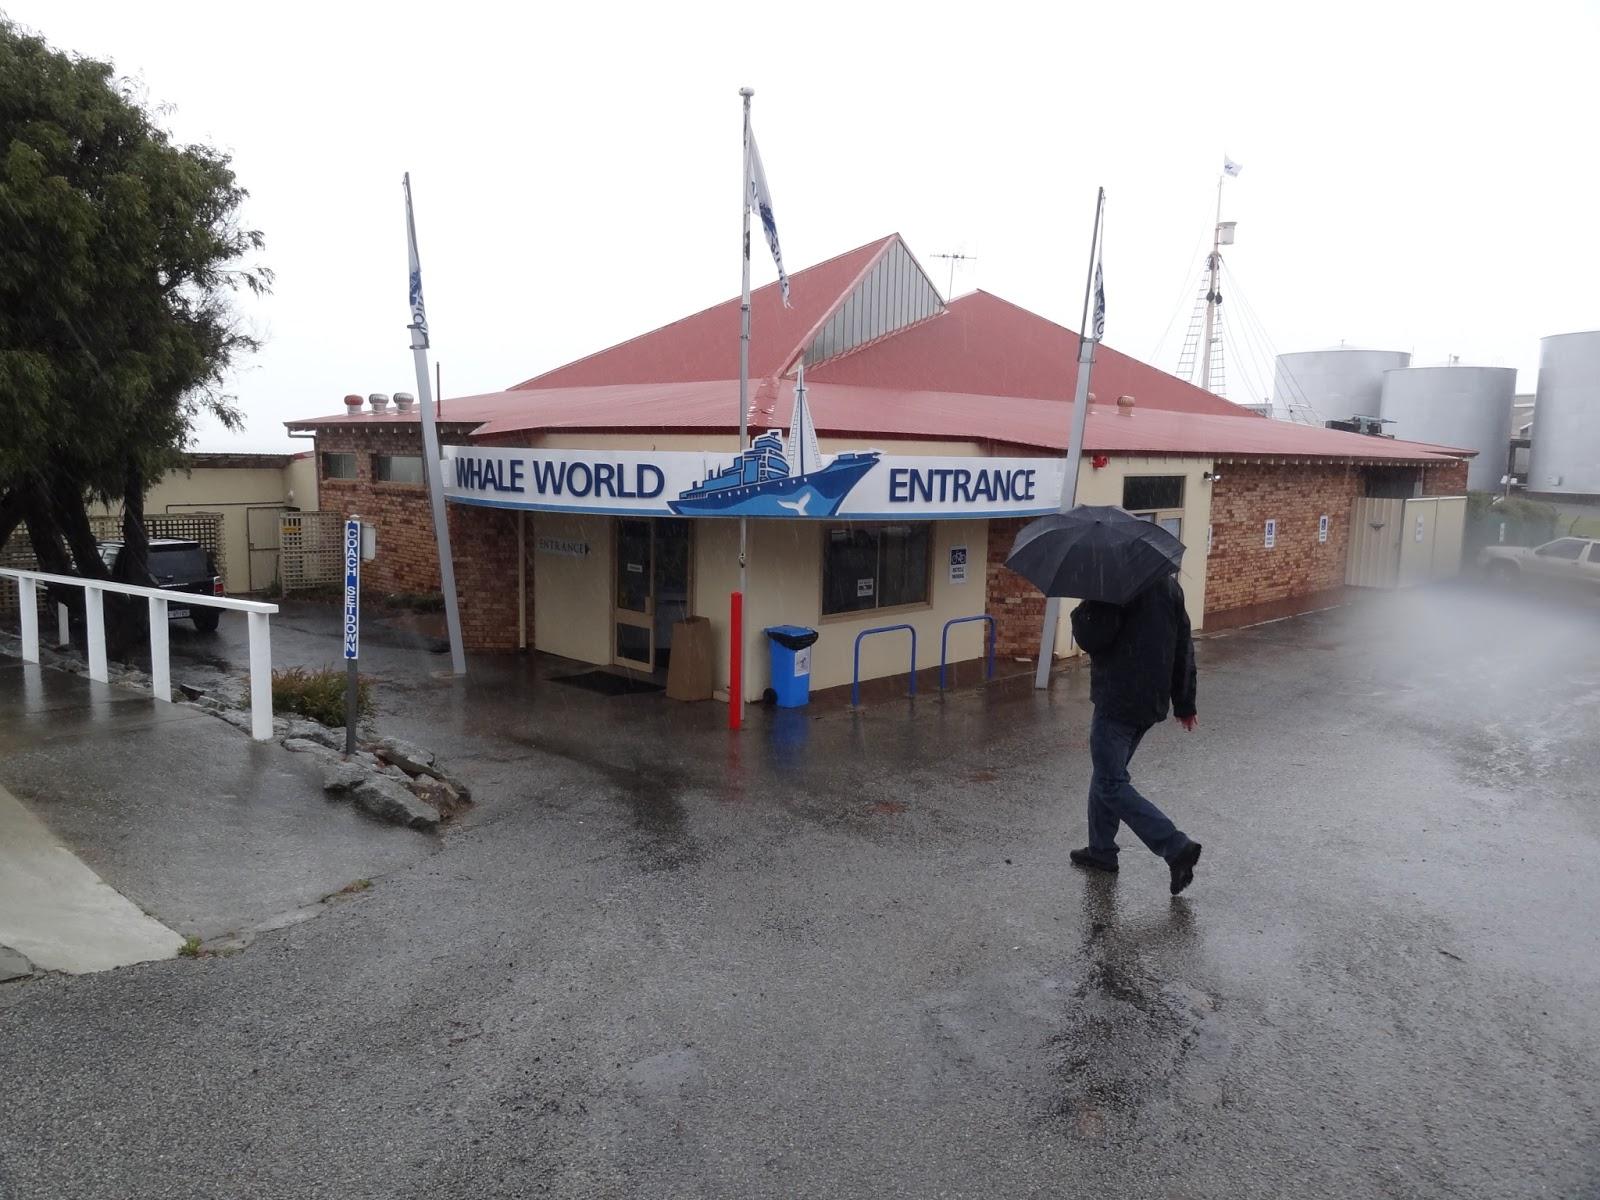 Whale World - in the rain